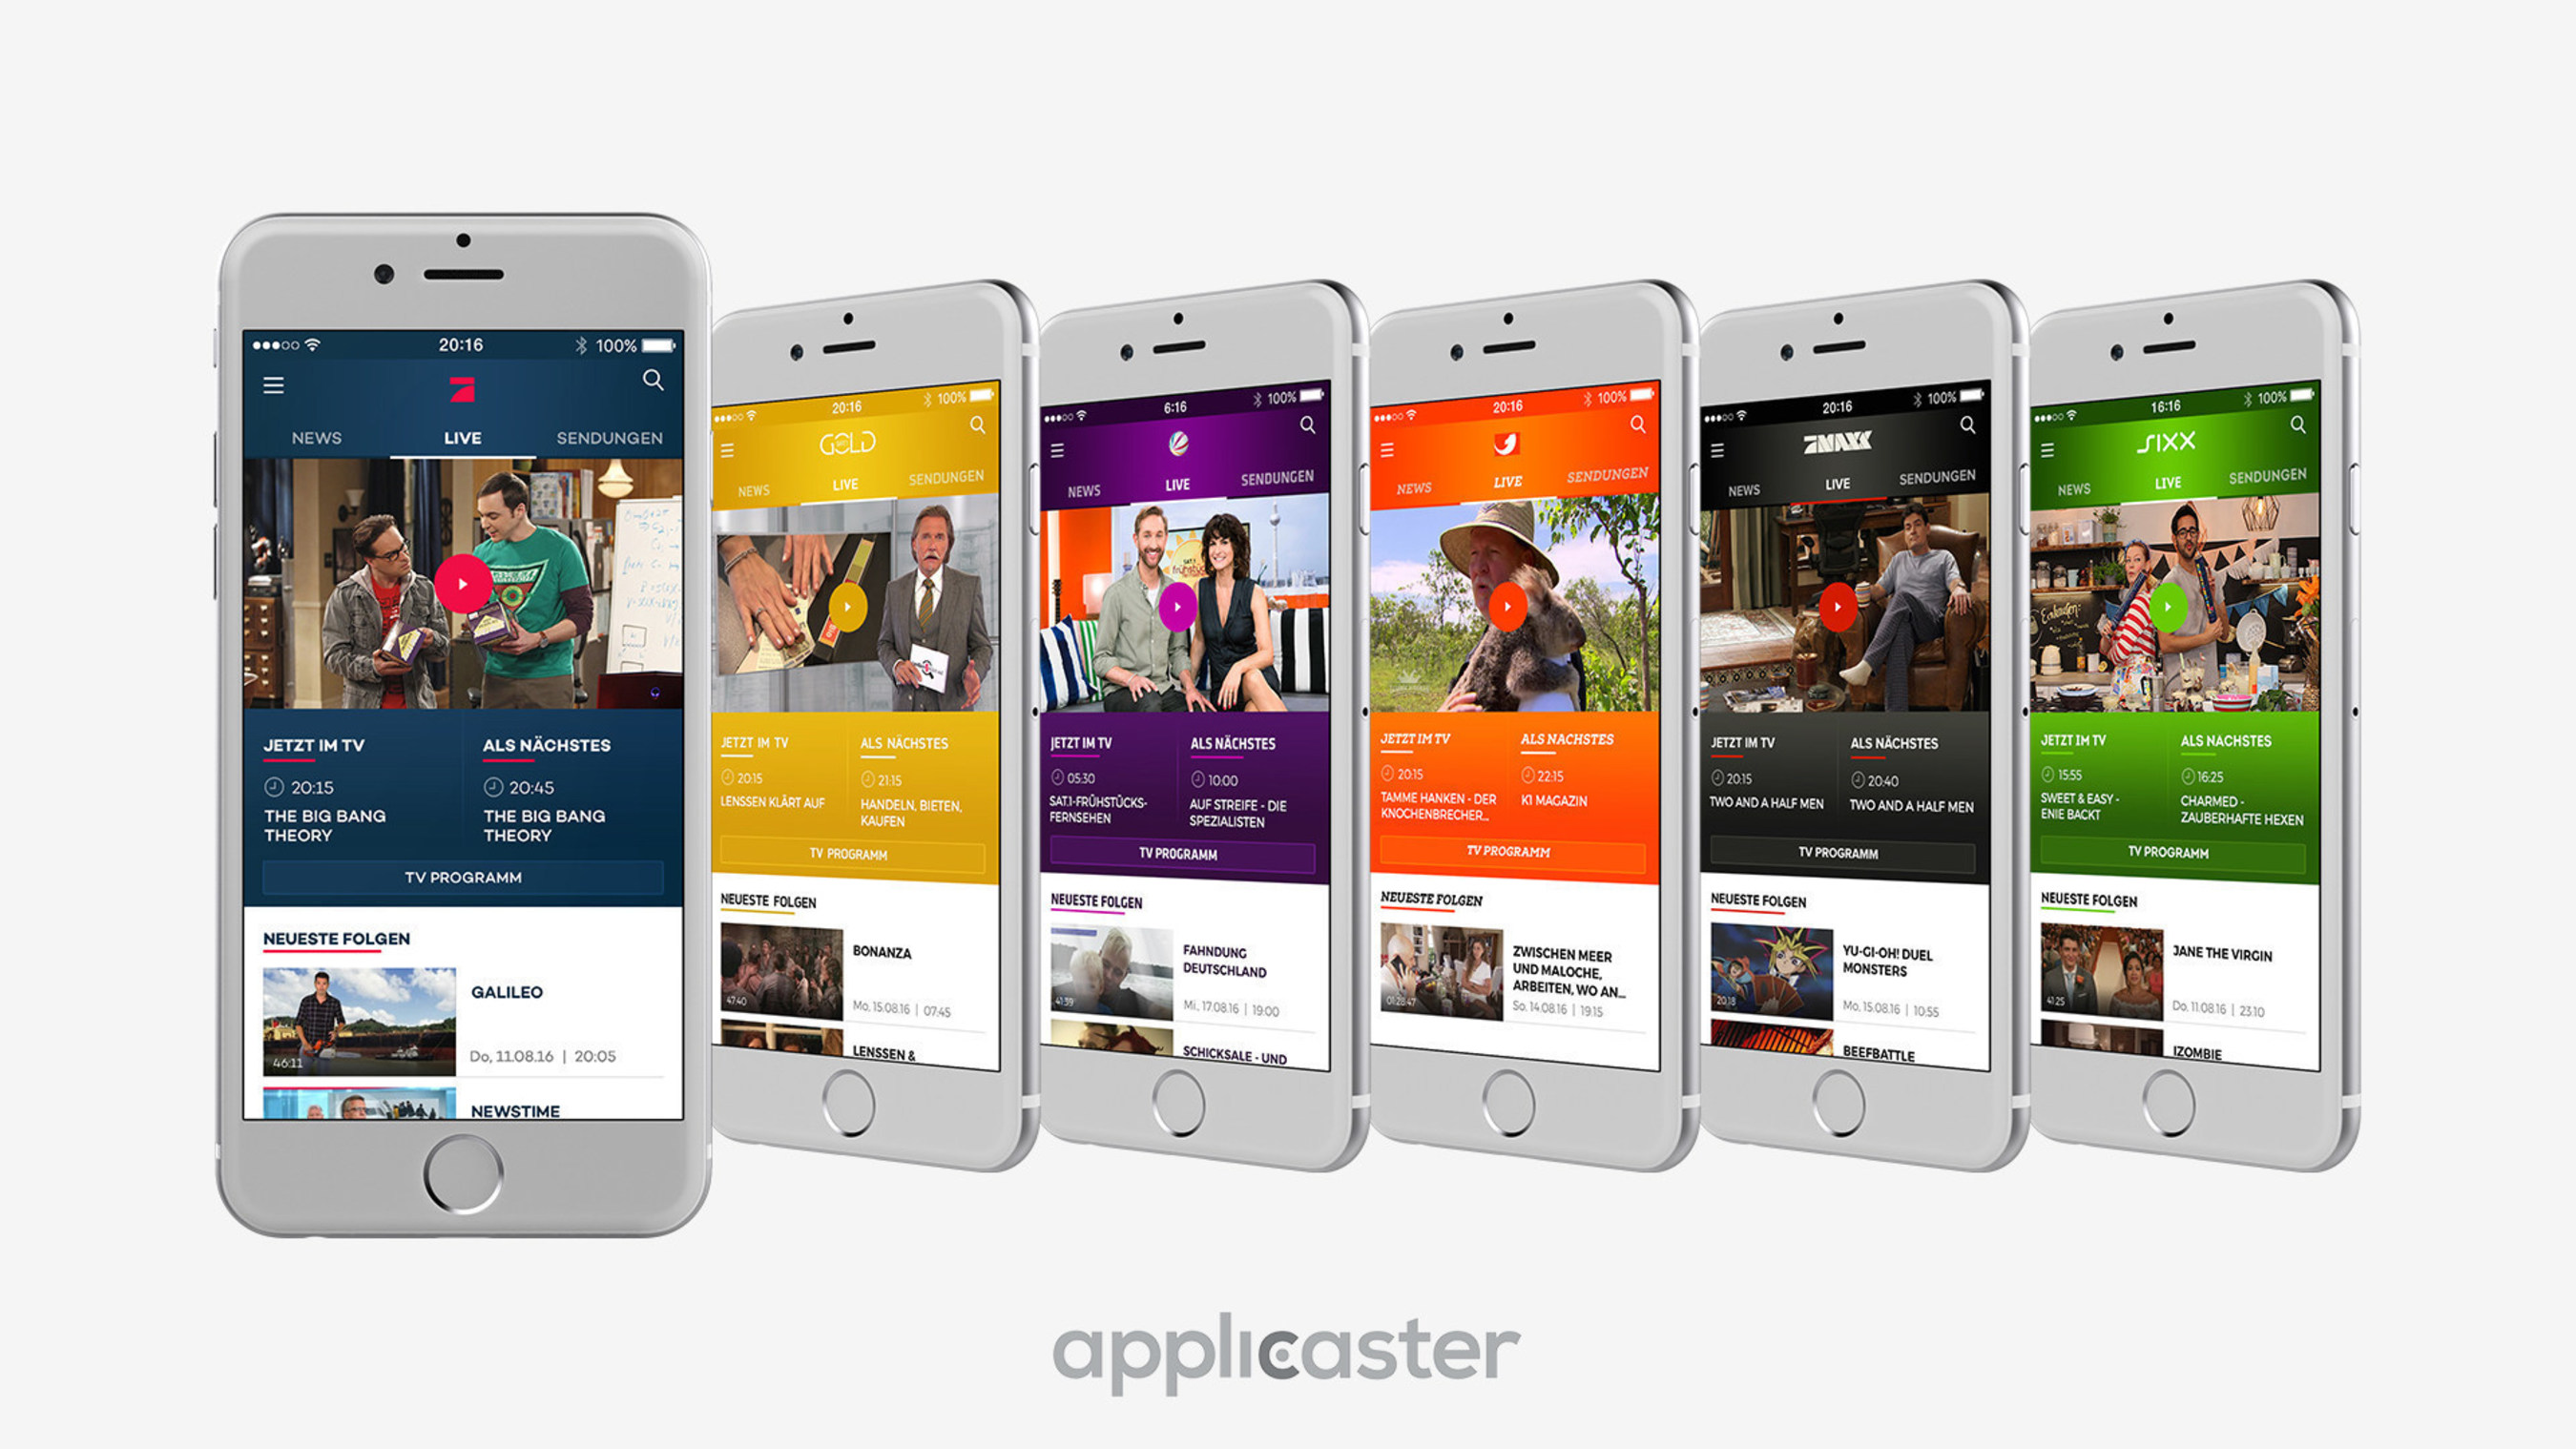 ProSiebenSat.1 Apps built using Applicaster's SaaS platform